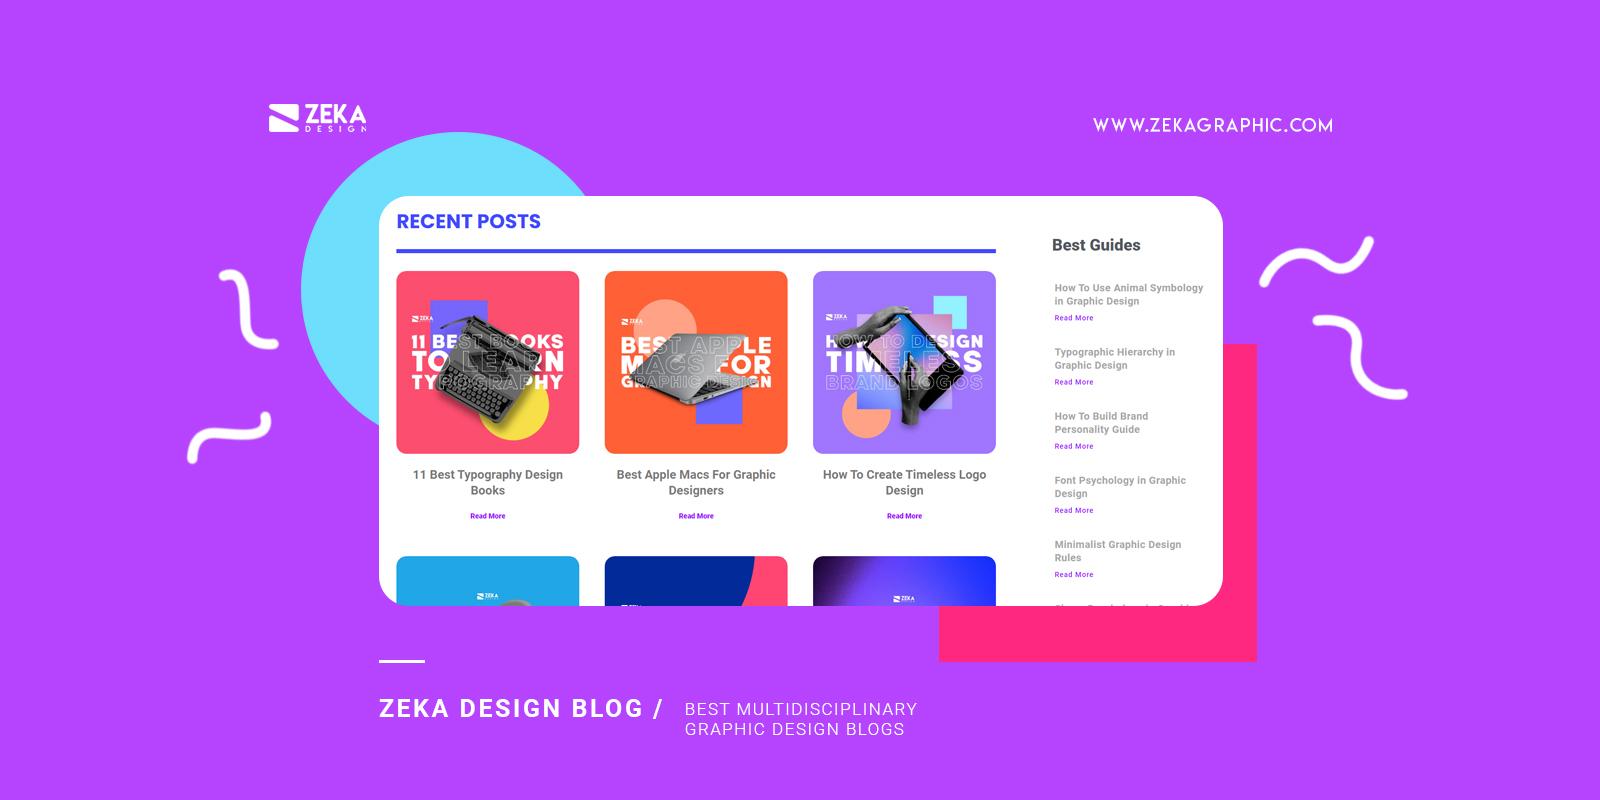 Zeka Design Blog Best Graphic Design Blogs